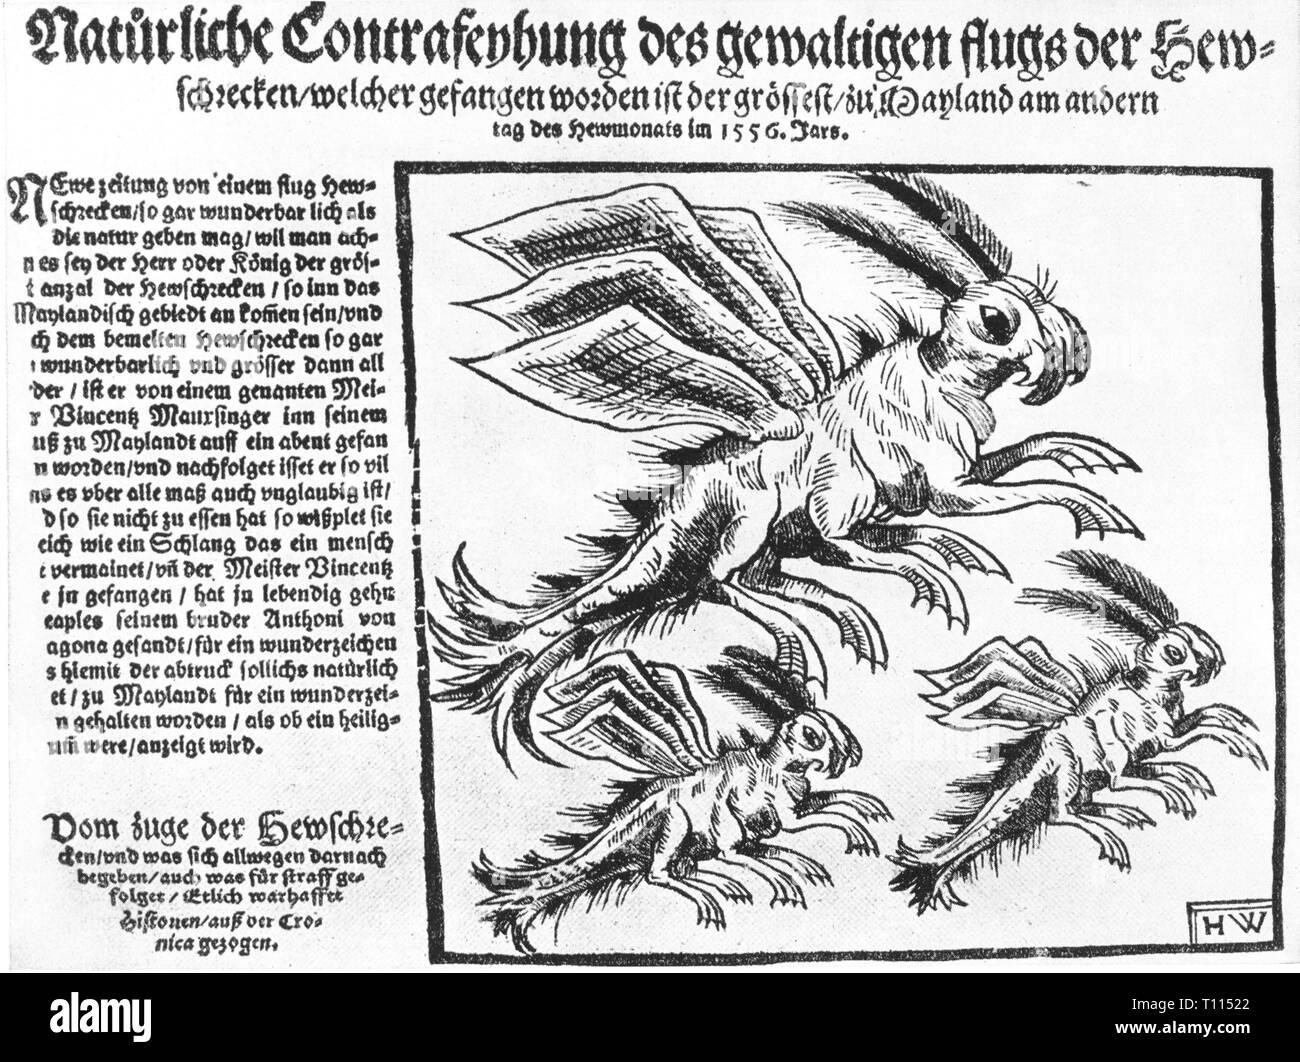 press / media, magazines, 'Natuerliche Contrafeyhung des gewaltigen flugs der Heswchrecken' (Natural image of the giant locust flight), front page, woodcut by HW, Nuremberg, 1556, Artist's Copyright has not to be cleared - Stock Image